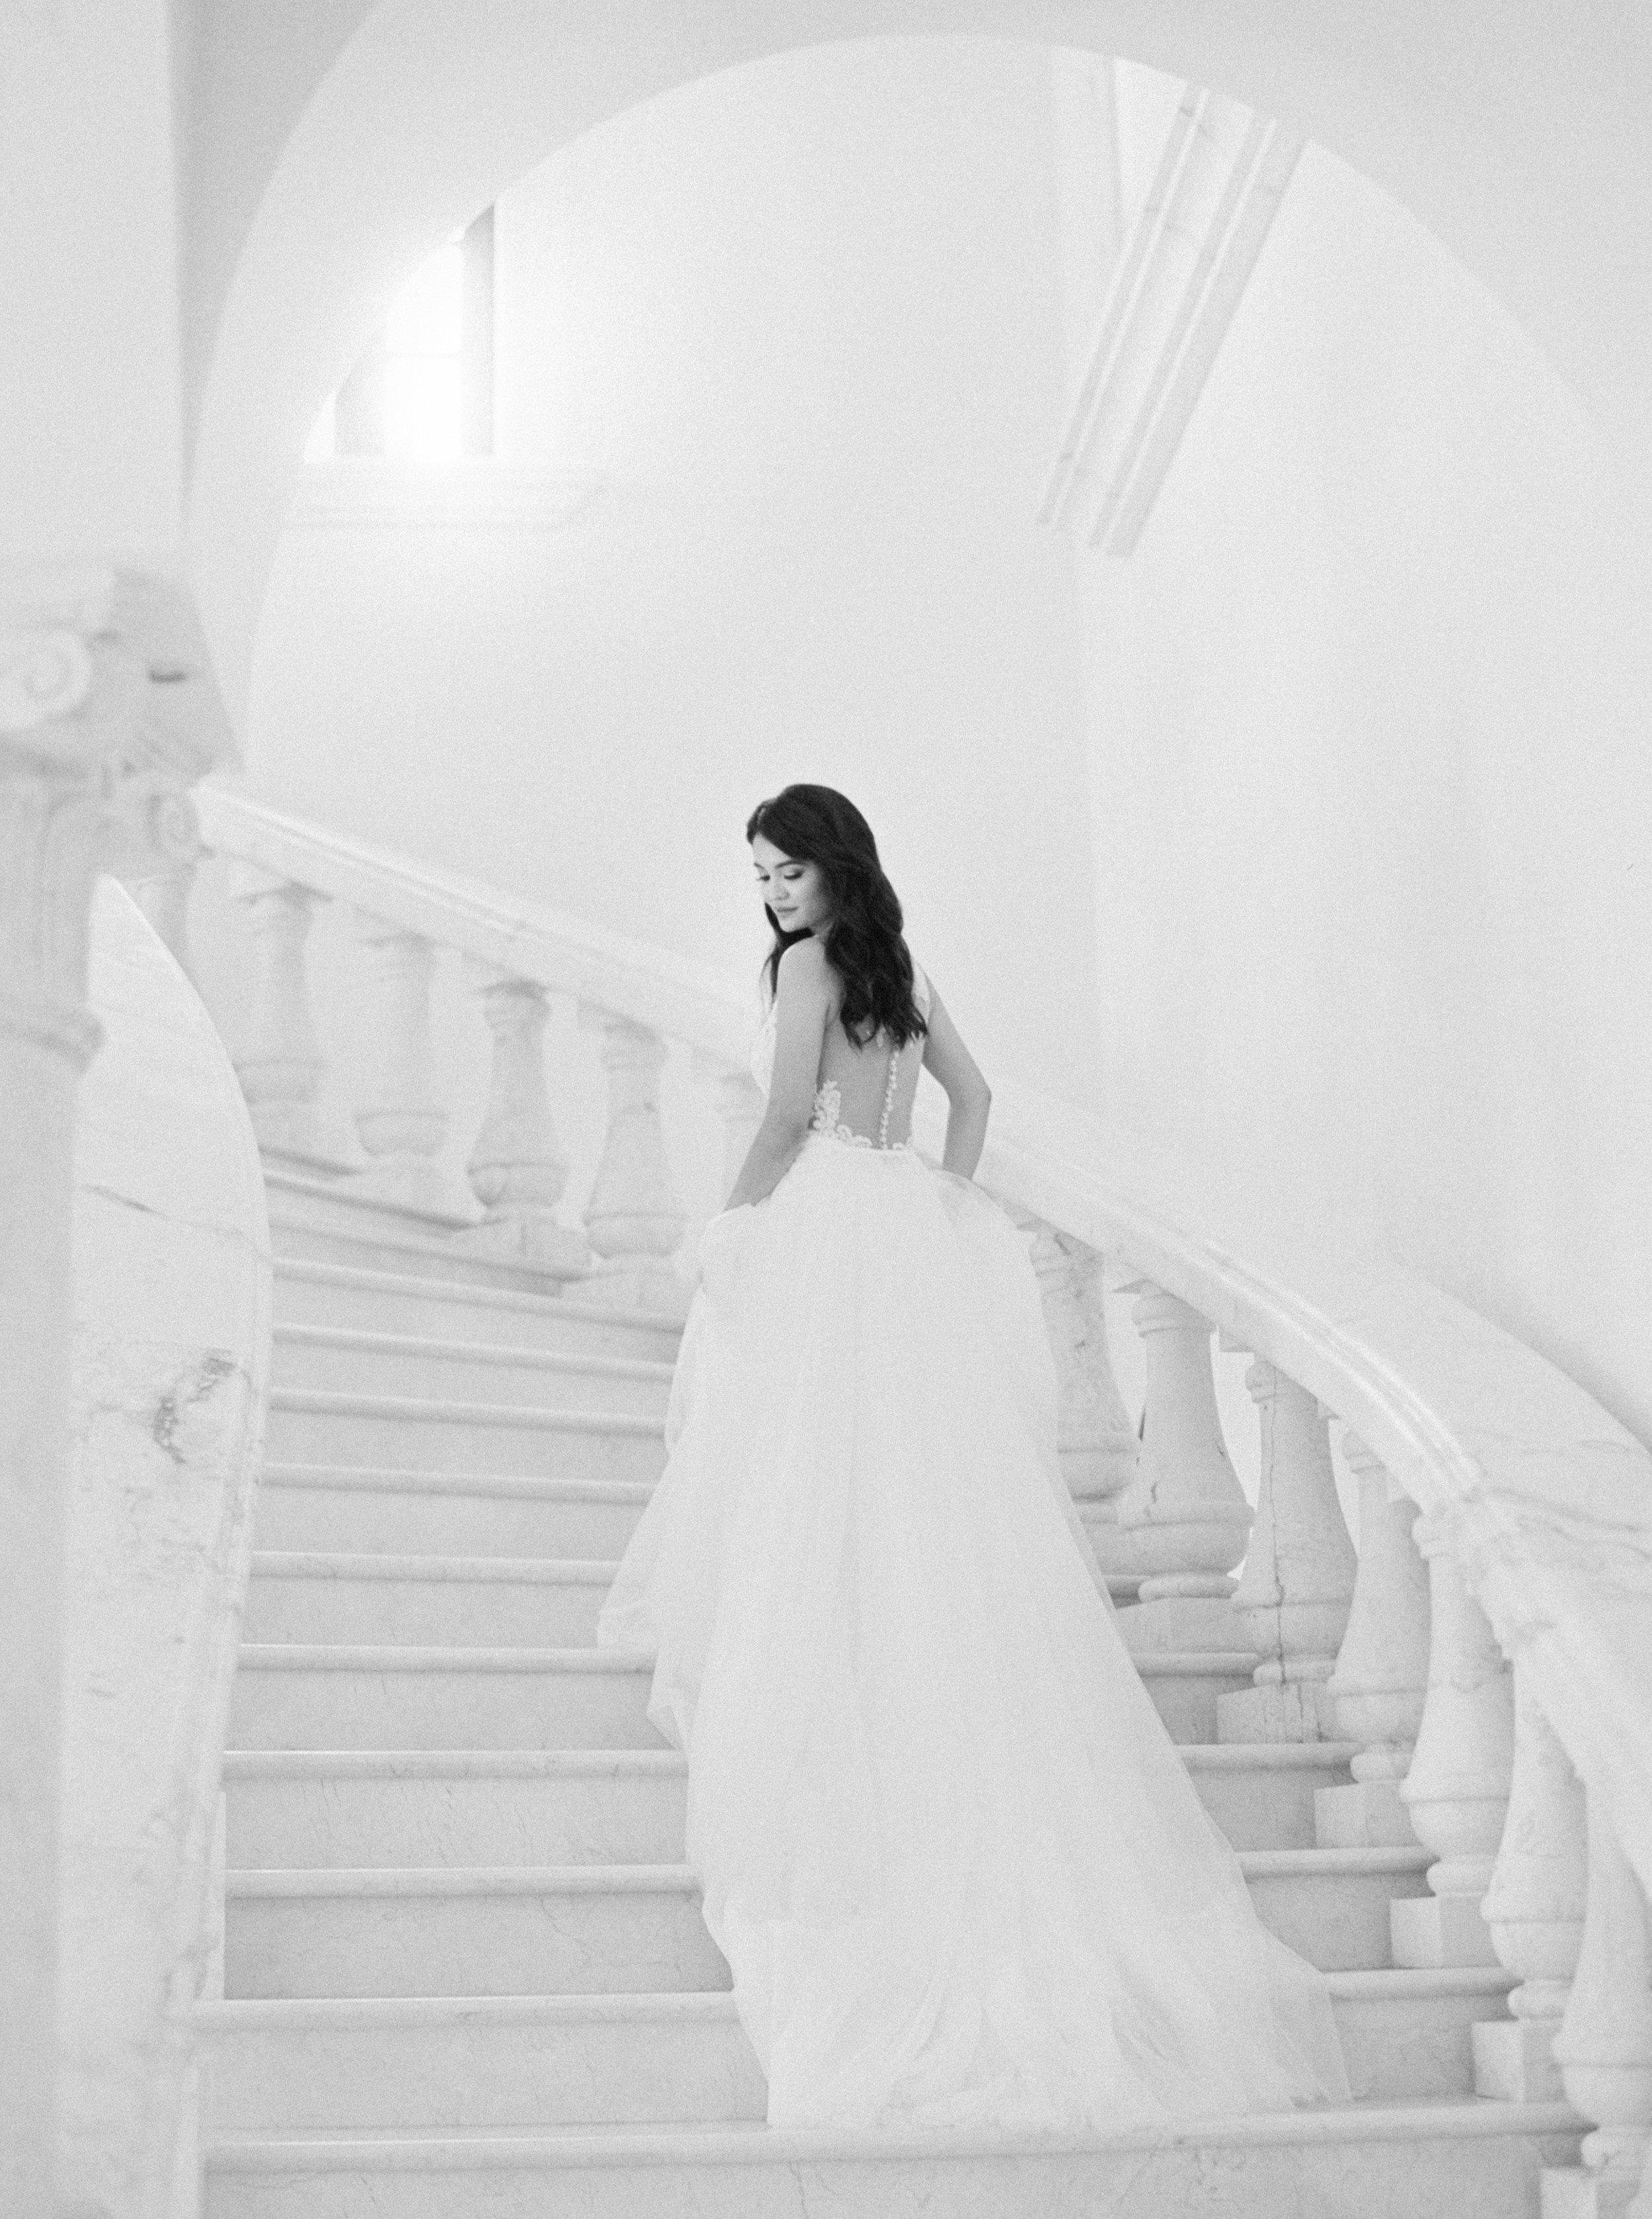 mexico-wedding-photographer-soft-airy-kurtz-toronto-chris-aleli-20.jpg